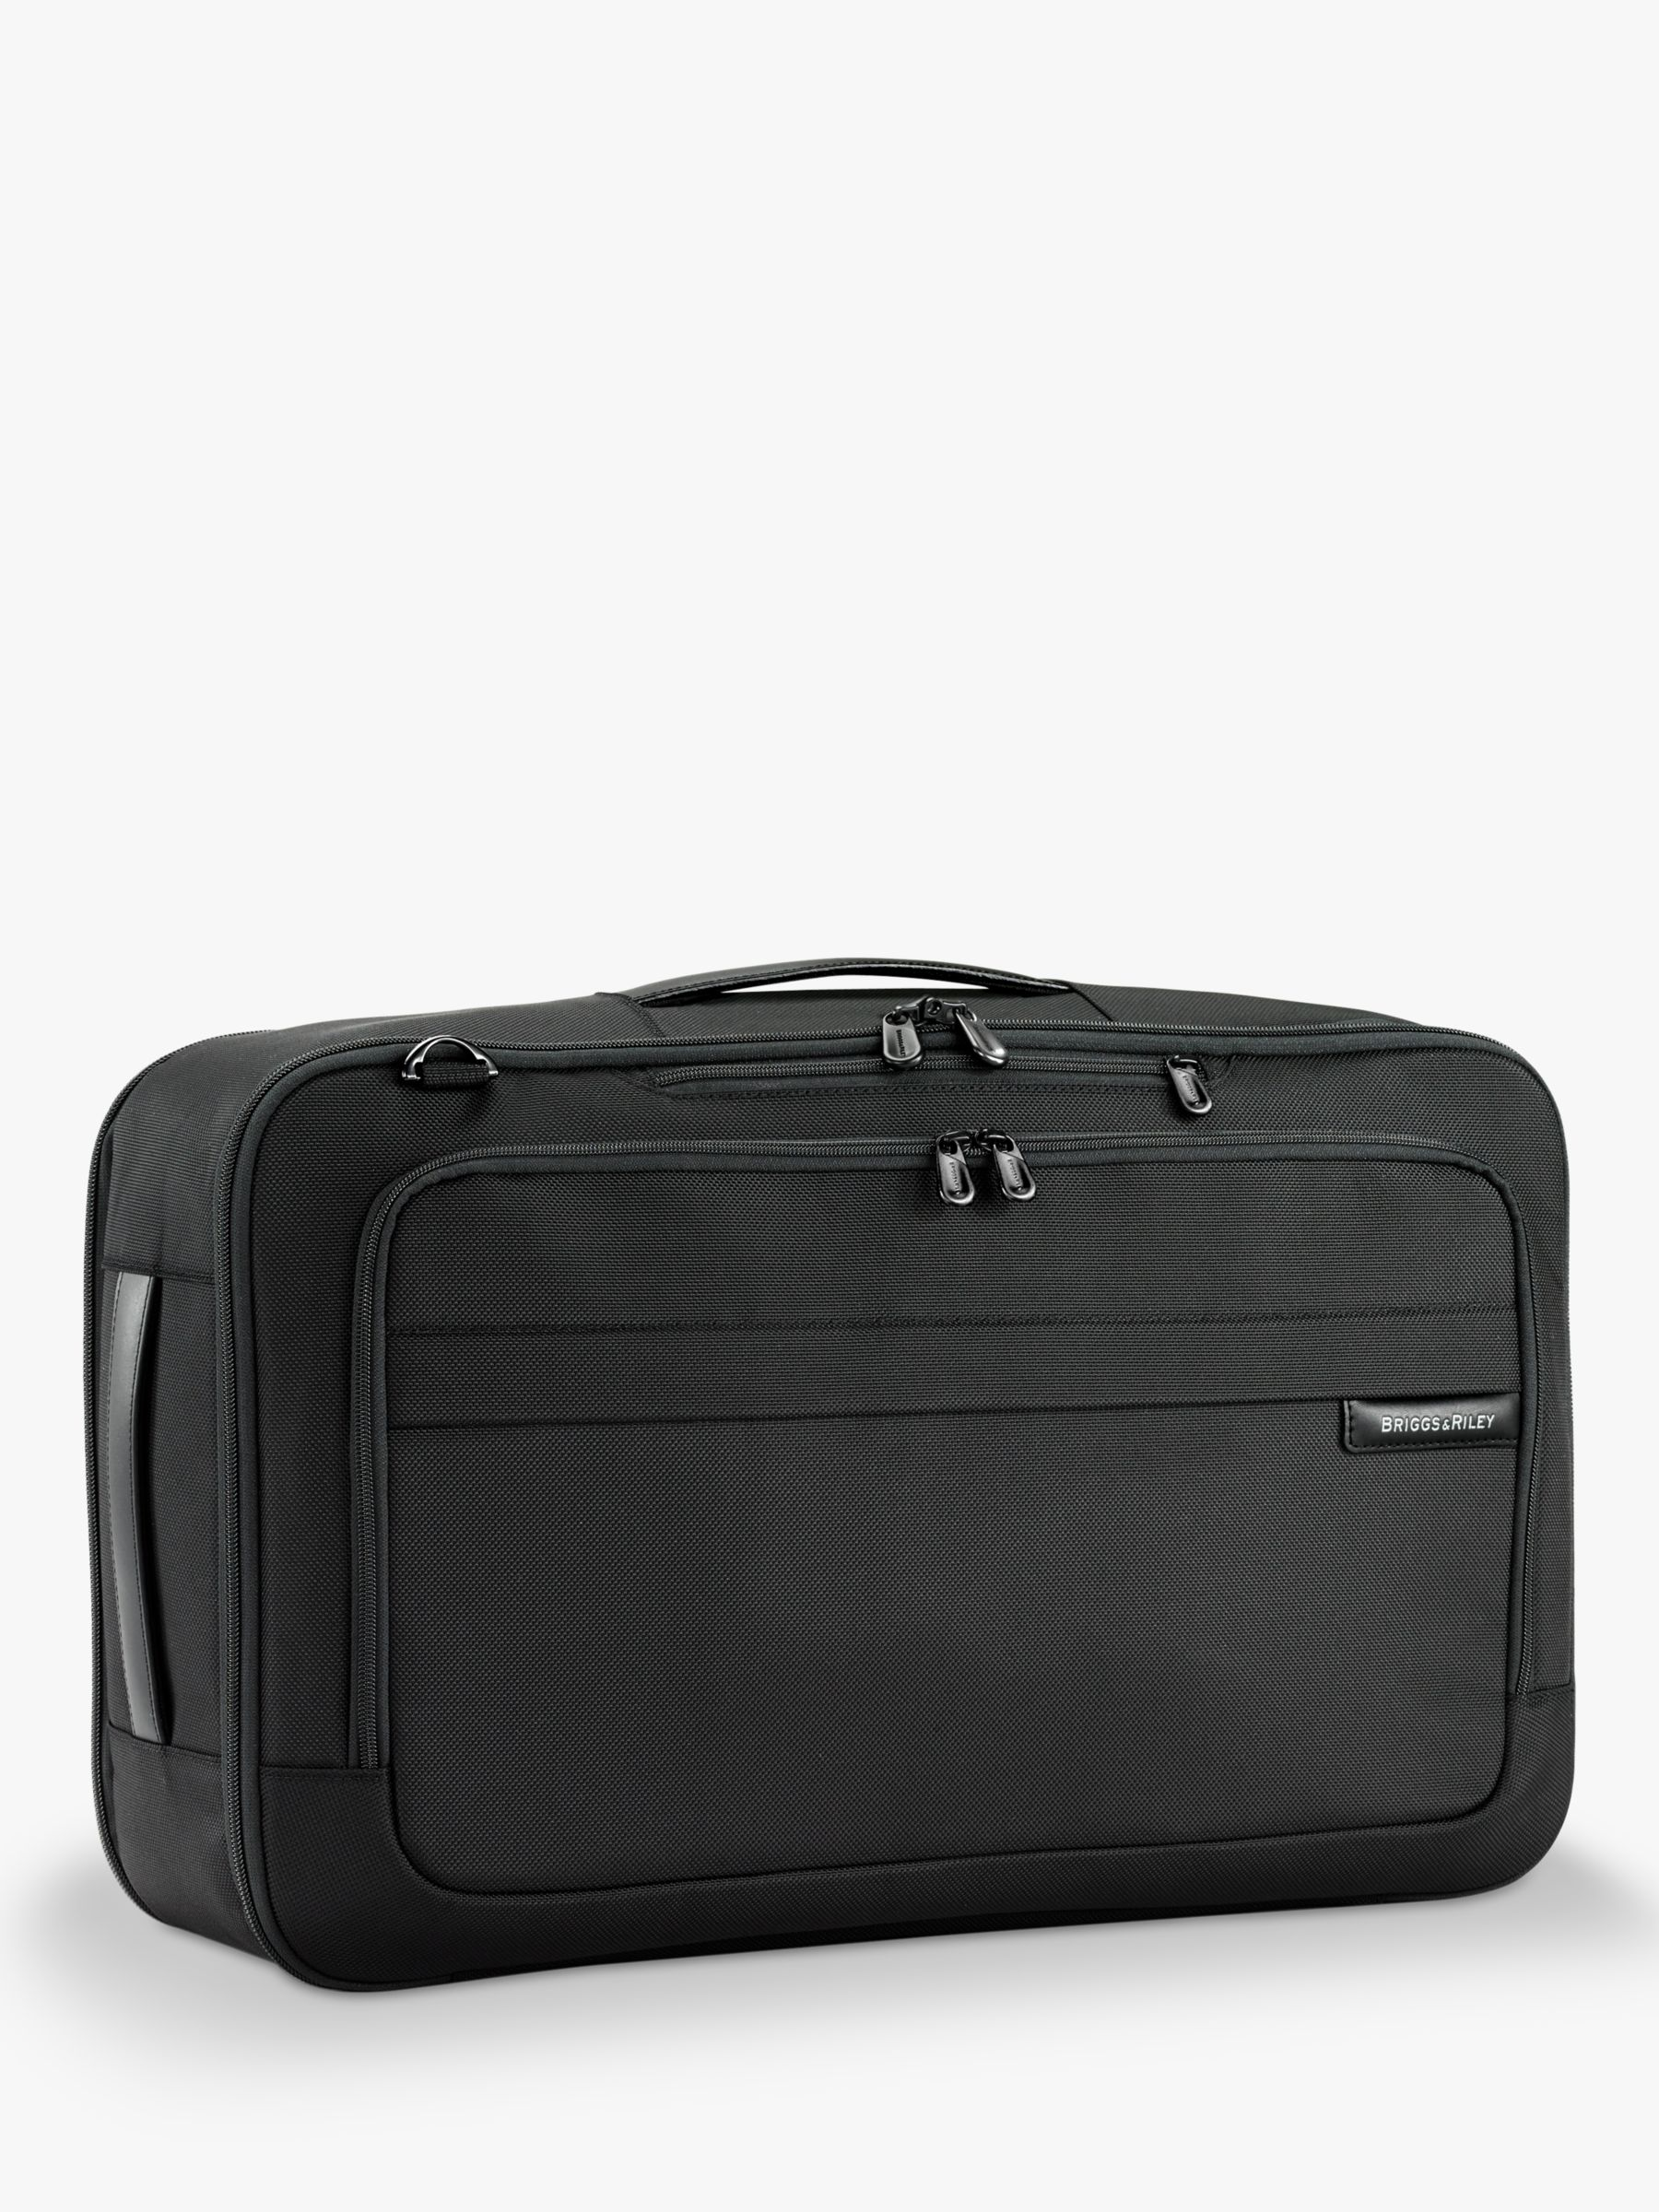 Briggs & Riley Briggs & Riley Baseline Convertible Duffle Backpack, Black